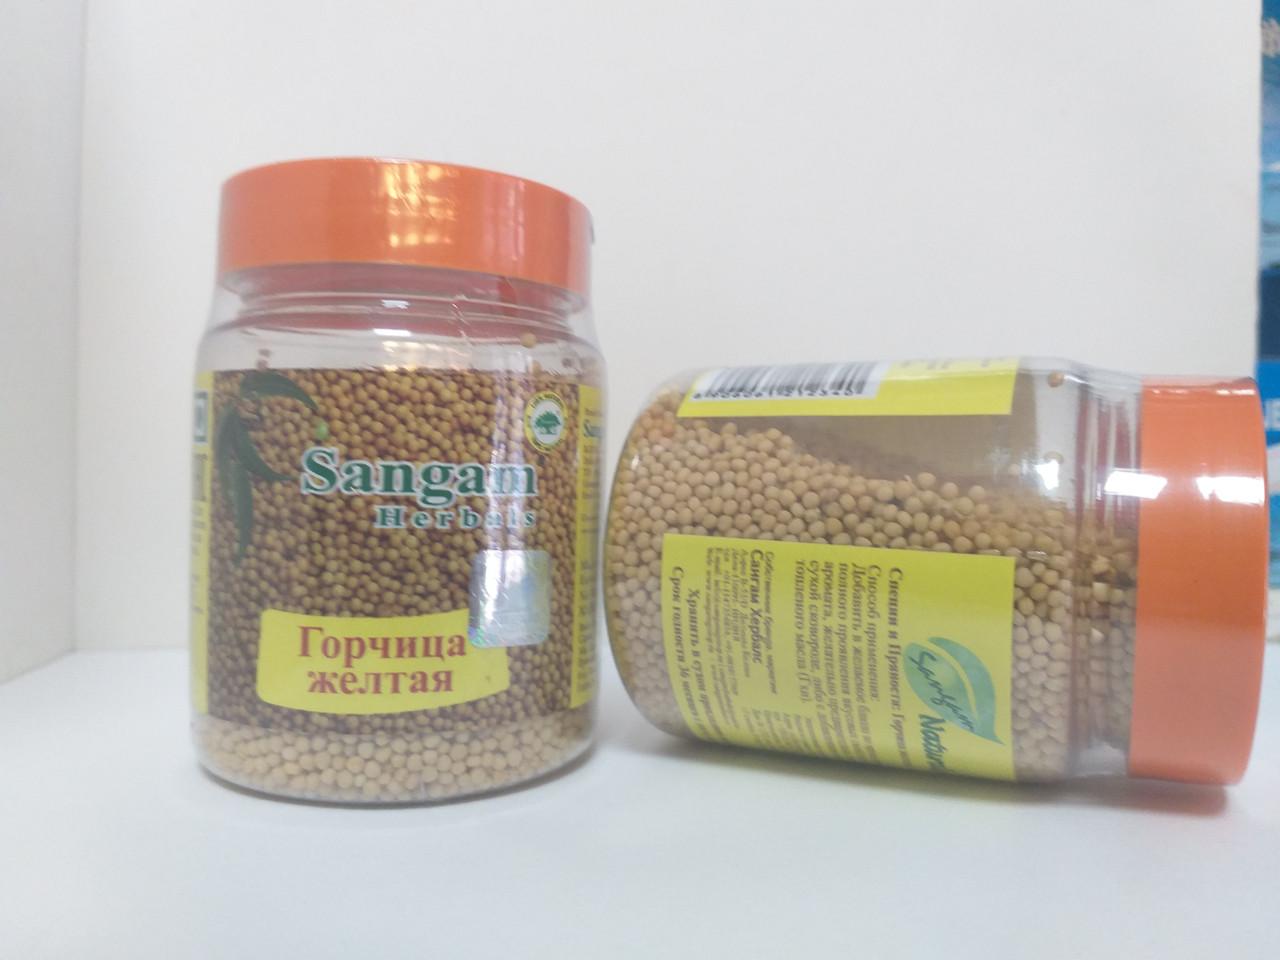 Горчица желтая, семена, 100 гр, Сангам